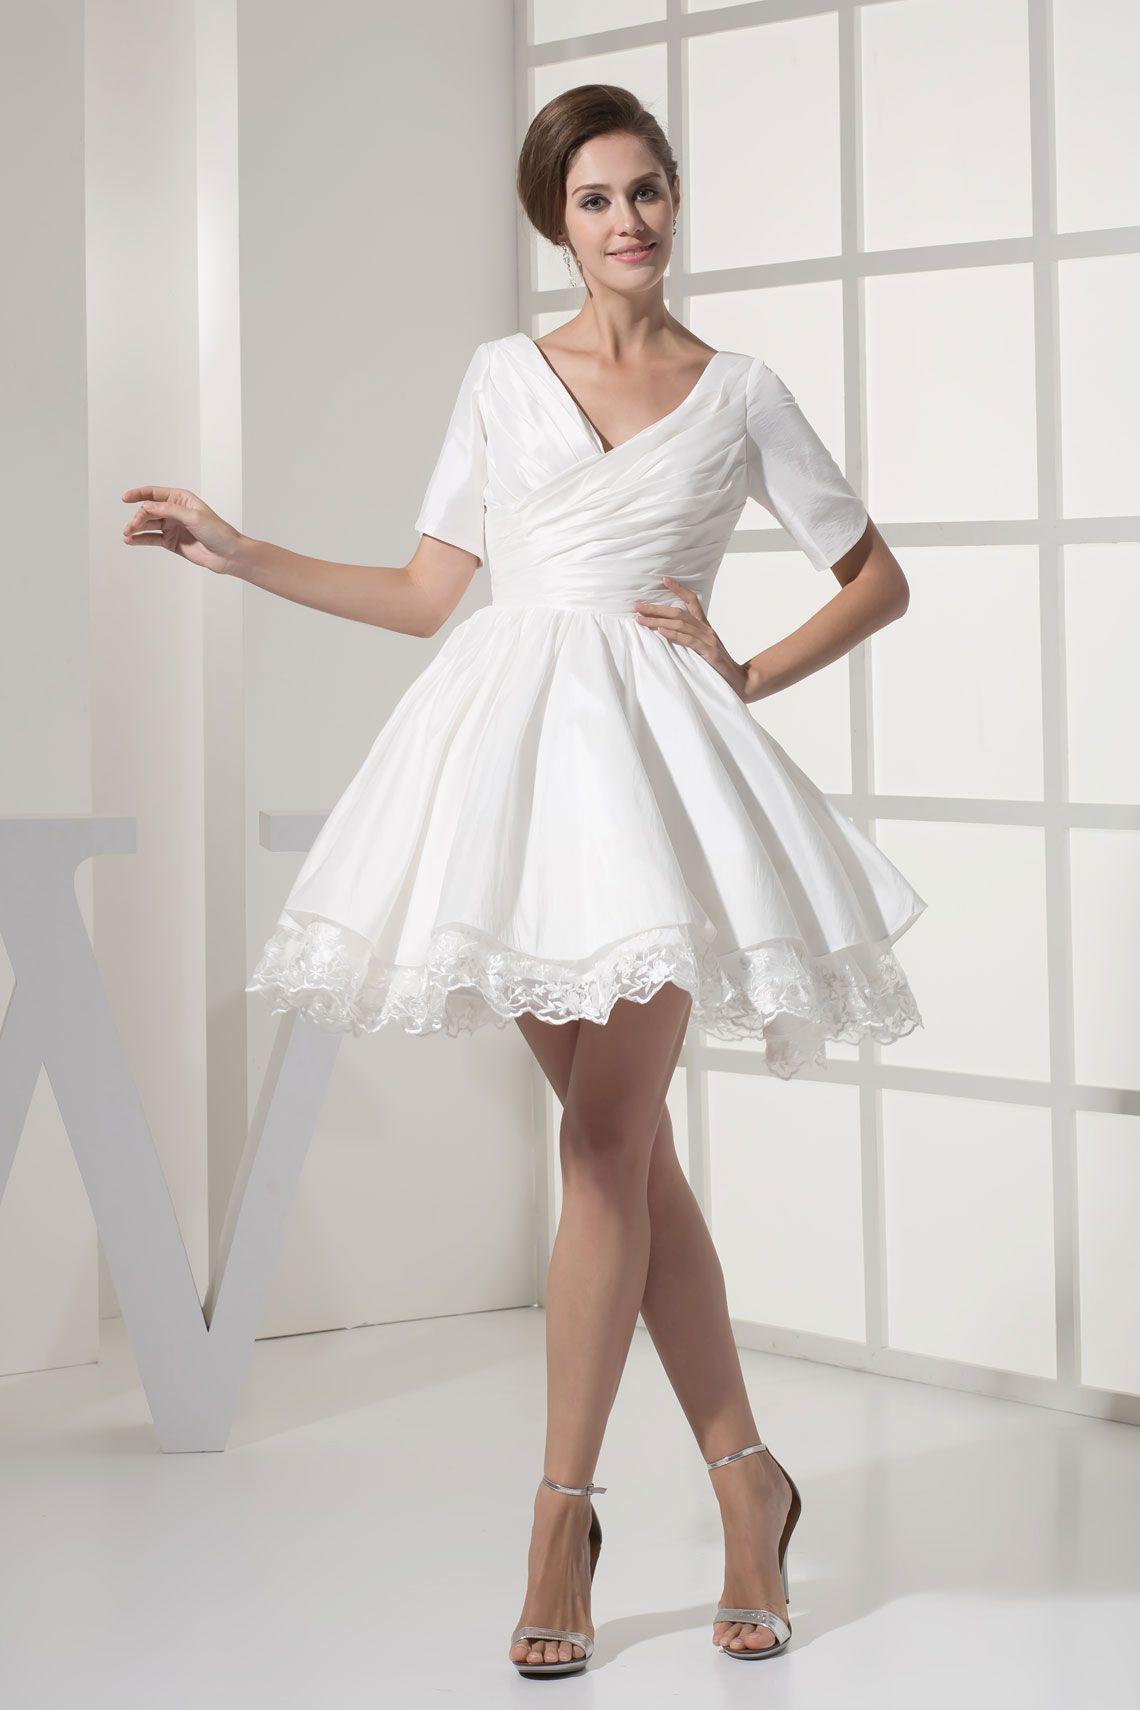 50th wedding anniversary dresses  prom dressprom dresses  prom dresses uk  Pinterest  Wedding